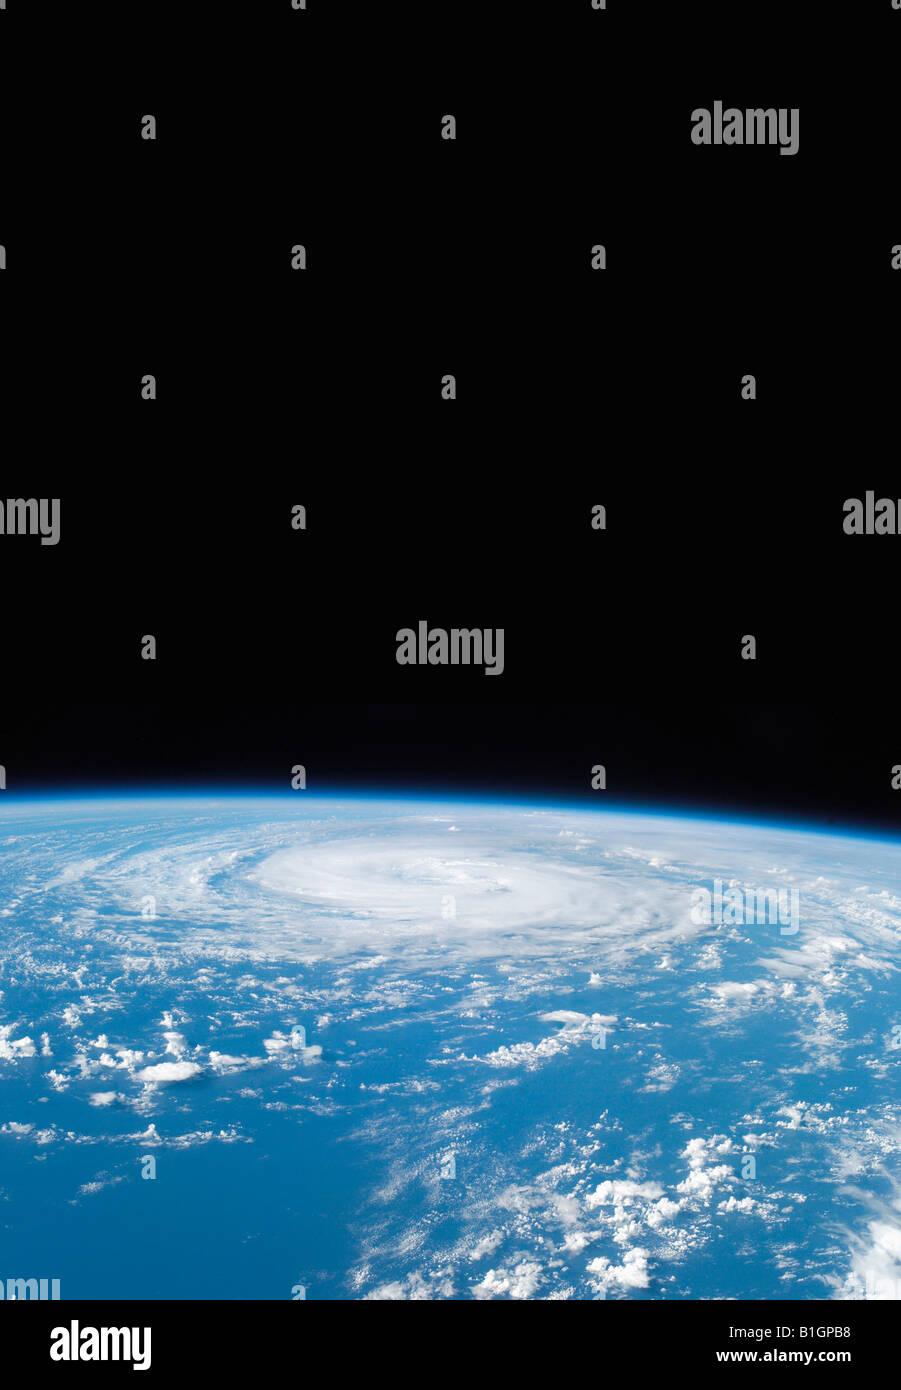 Hurrikan-Epsilon aus dem Weltraum Stockfoto